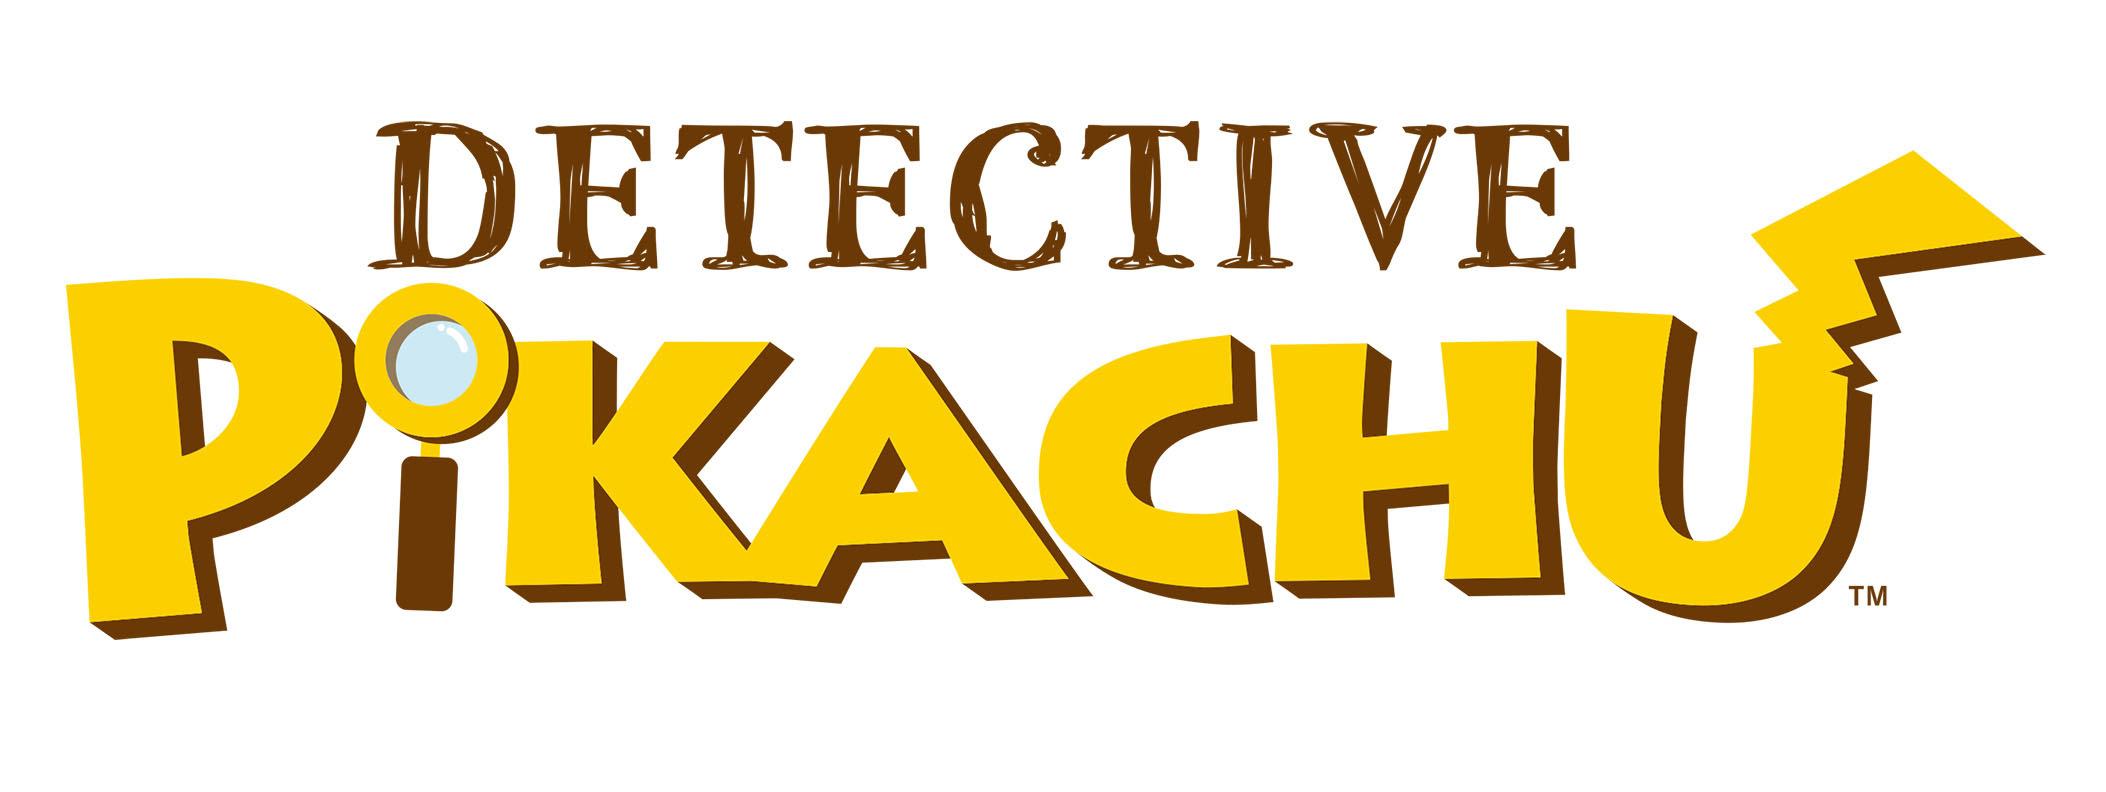 NP: Saca la lupa en Detective Pikachu para Nintendo 3DS, y surfea con Blastoise en Pokkén Tournament DX para Nintendo Switch